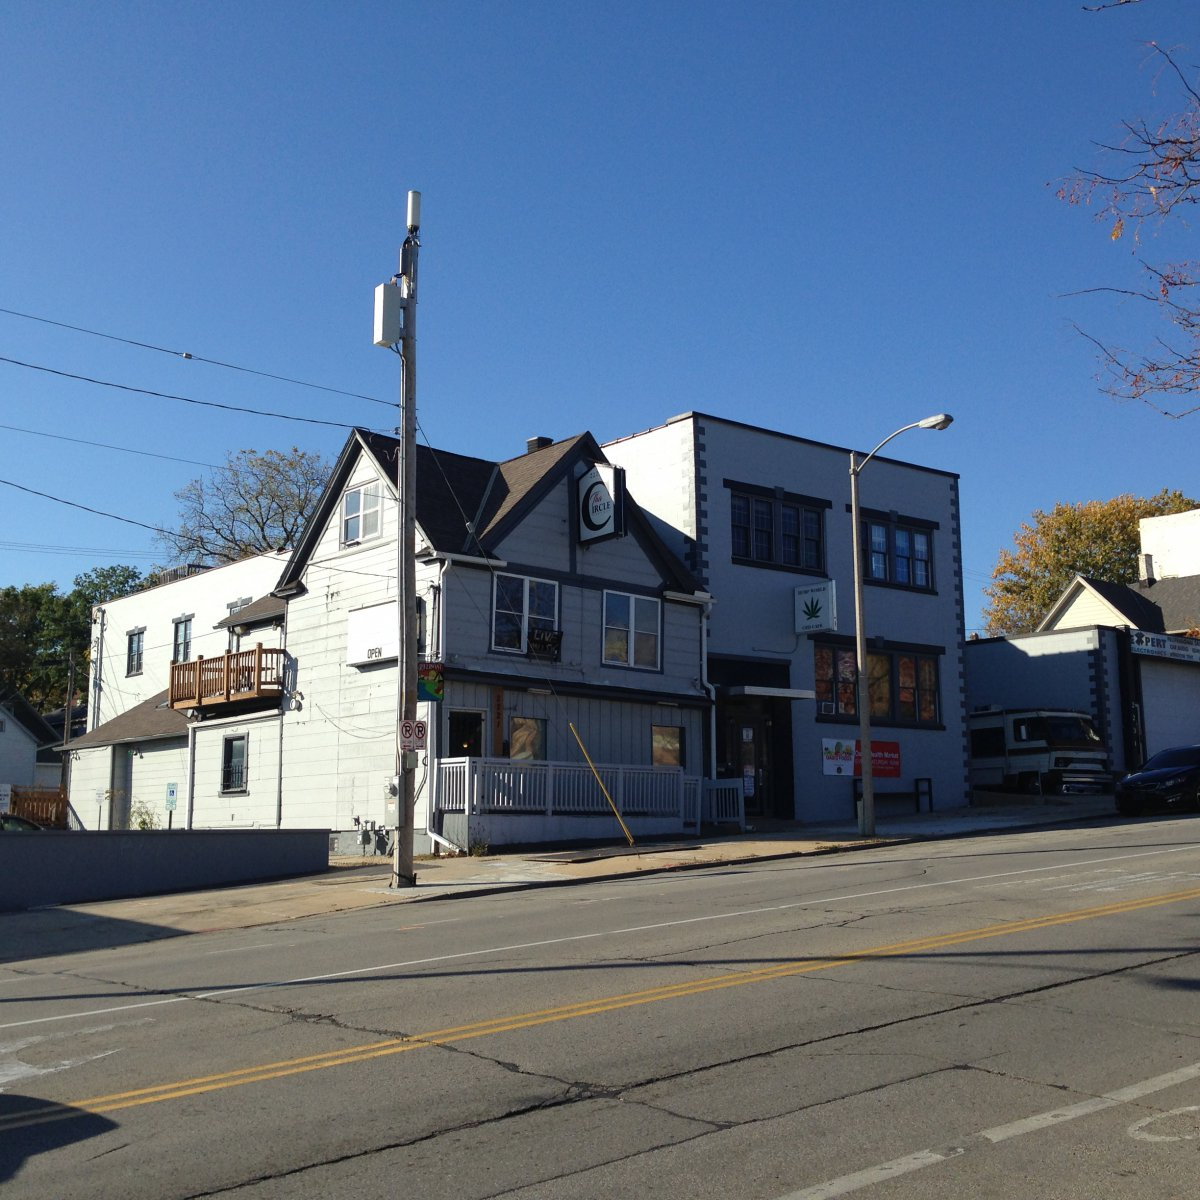 2221 N. Humboldt Ave., 2227 N. Humboldt Ave.